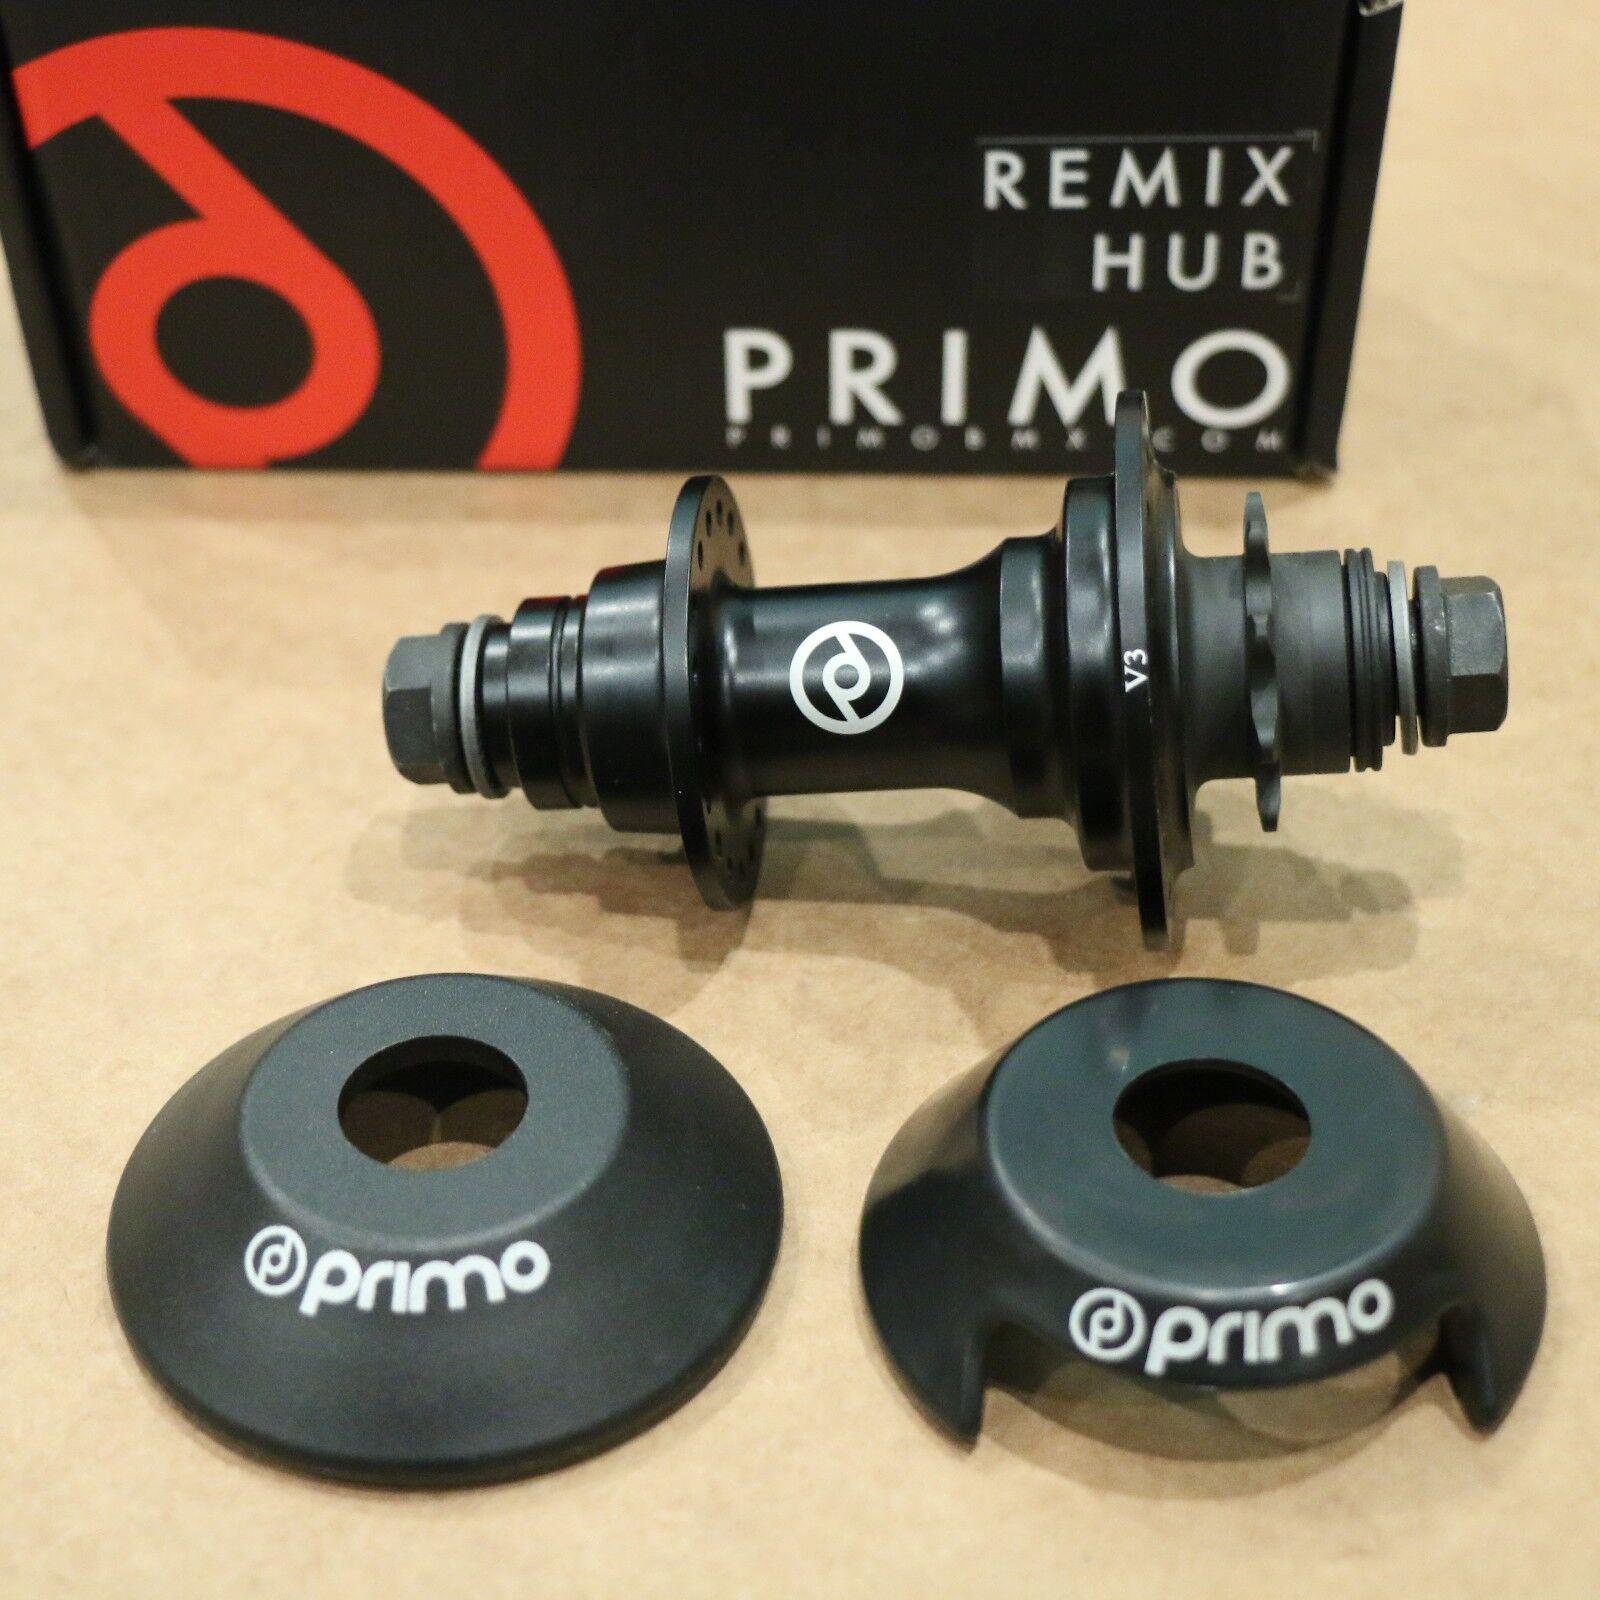 PRIMO BMX BIKE REMIX v3 CASSETTE HUB 14mm RHD 9T SHADOW ODYSSEY CULT STRANGER